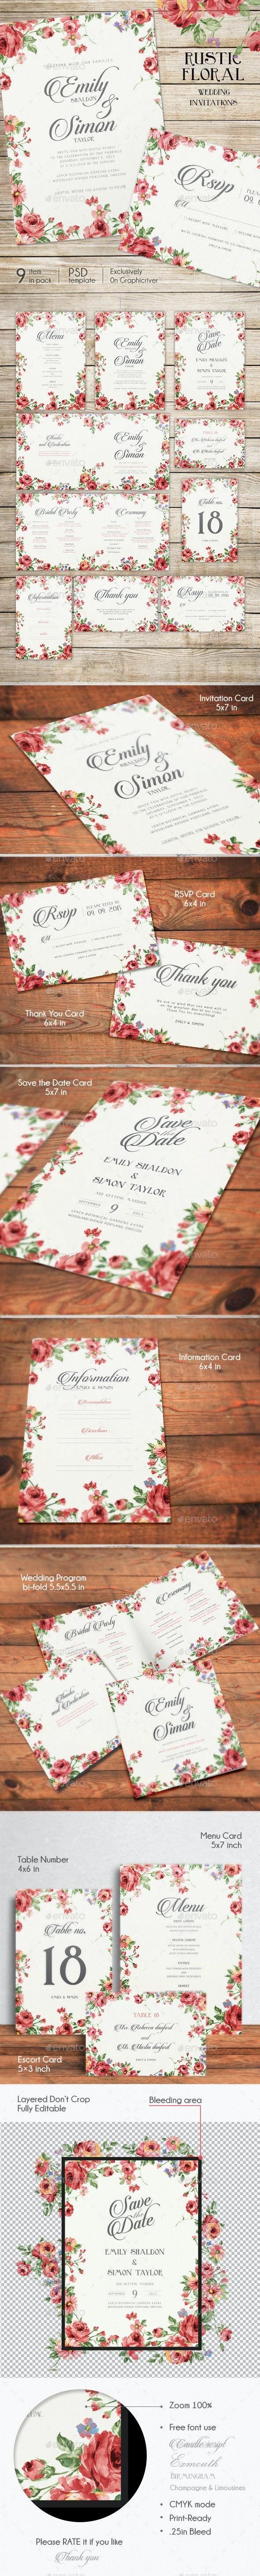 Rustic Floral Wedding Invitations - Weddings Cards & Invites